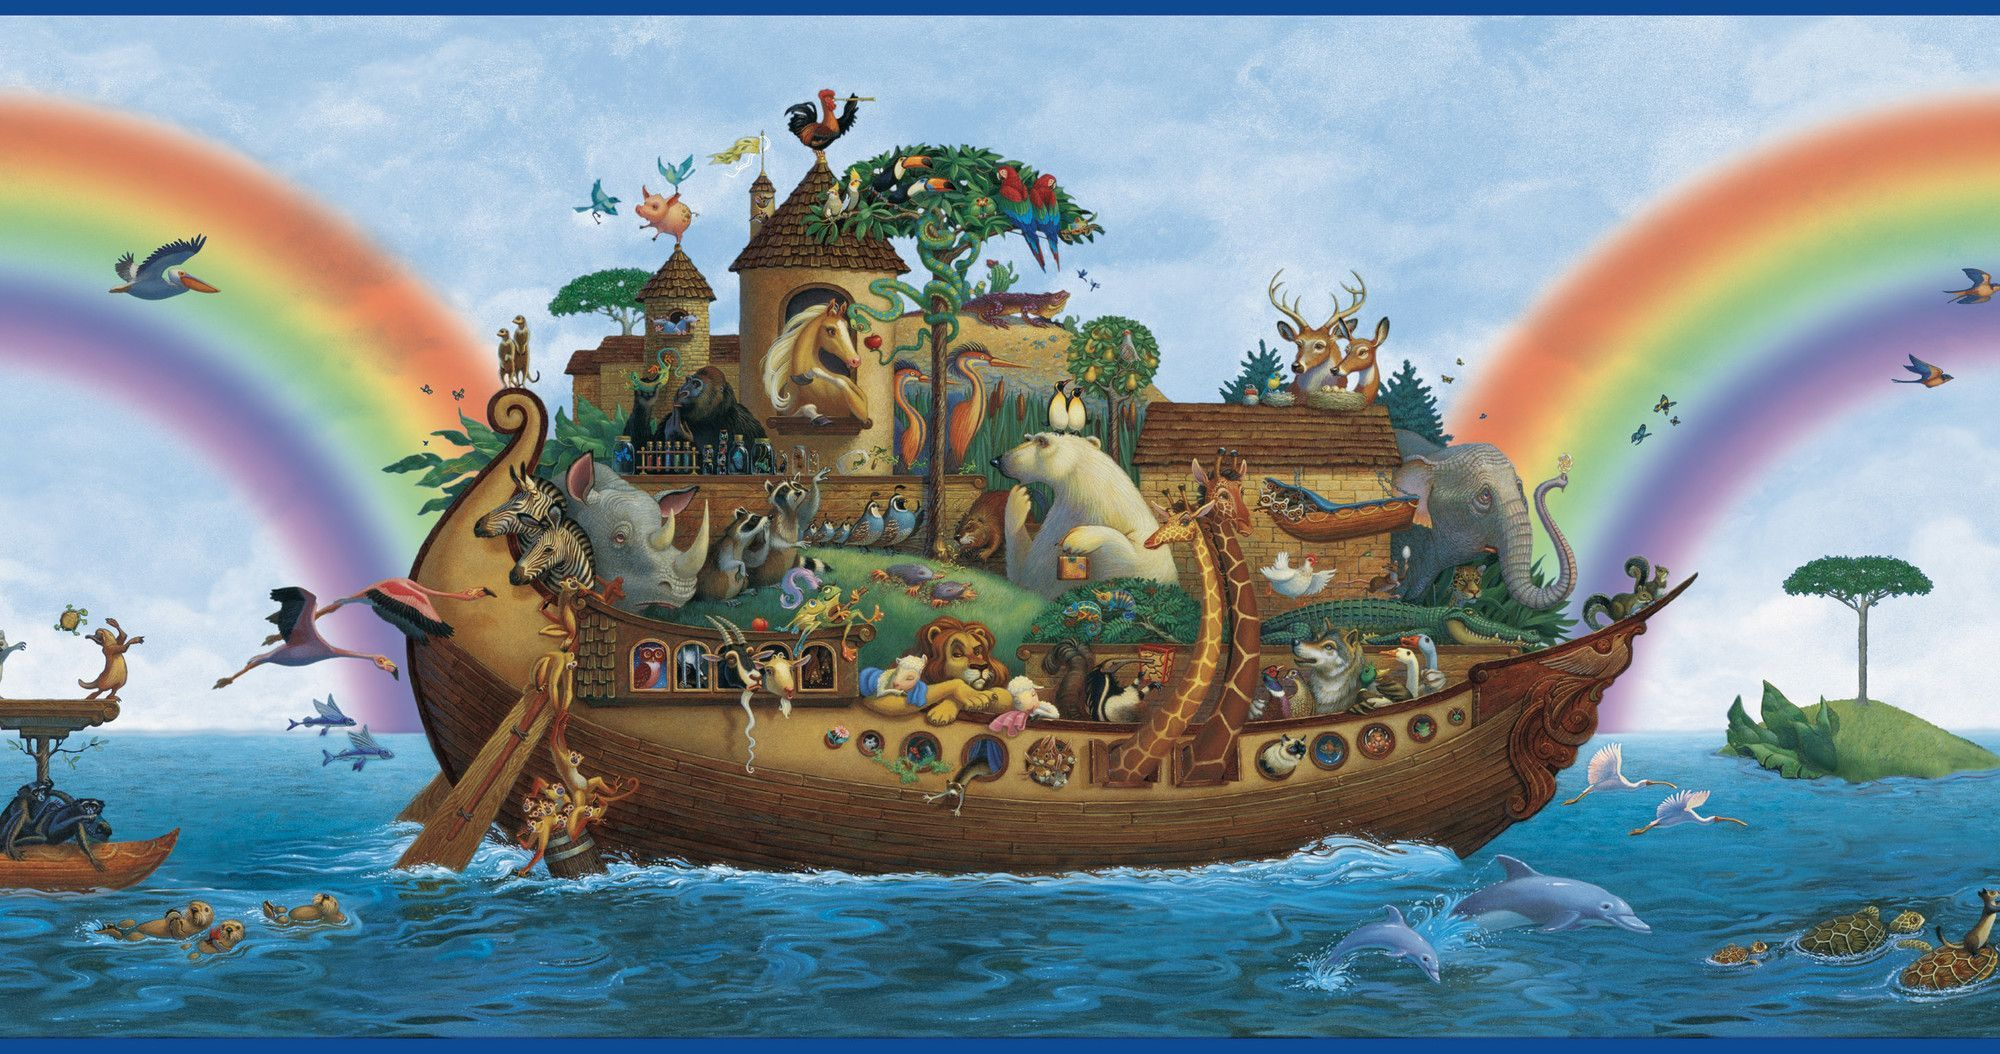 Borders by Chesapeake Majesty Noah's Ark Portrait 15' x 10